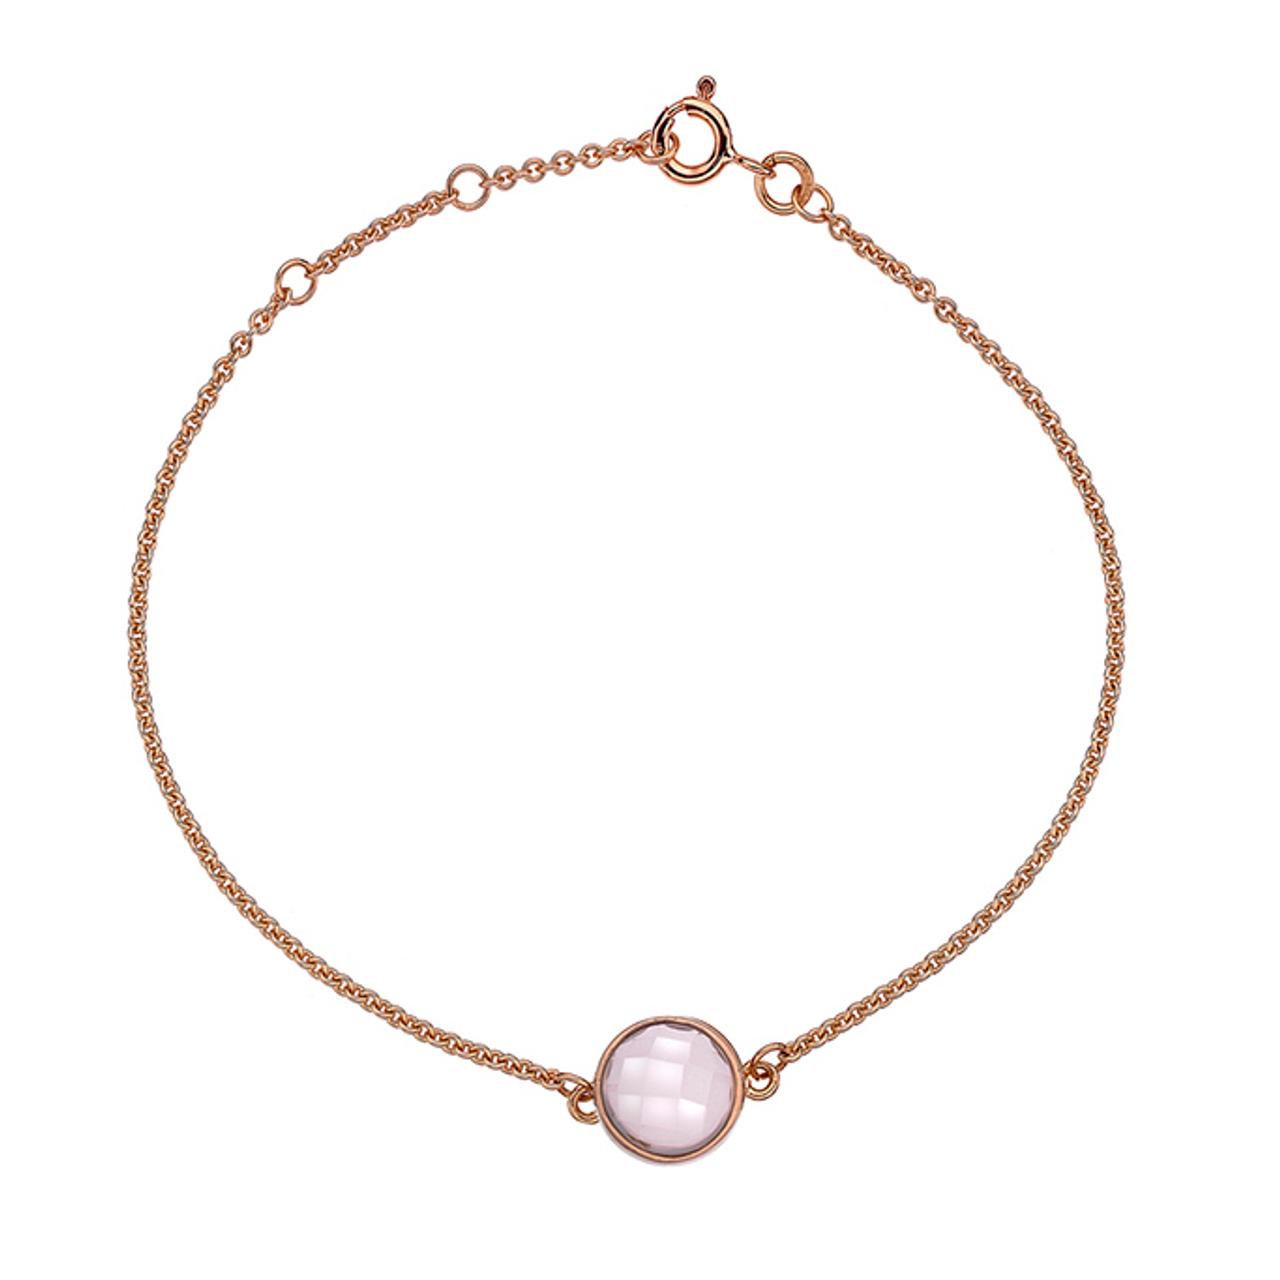 9ct Rose Gold & Rose Quartz Bracelet